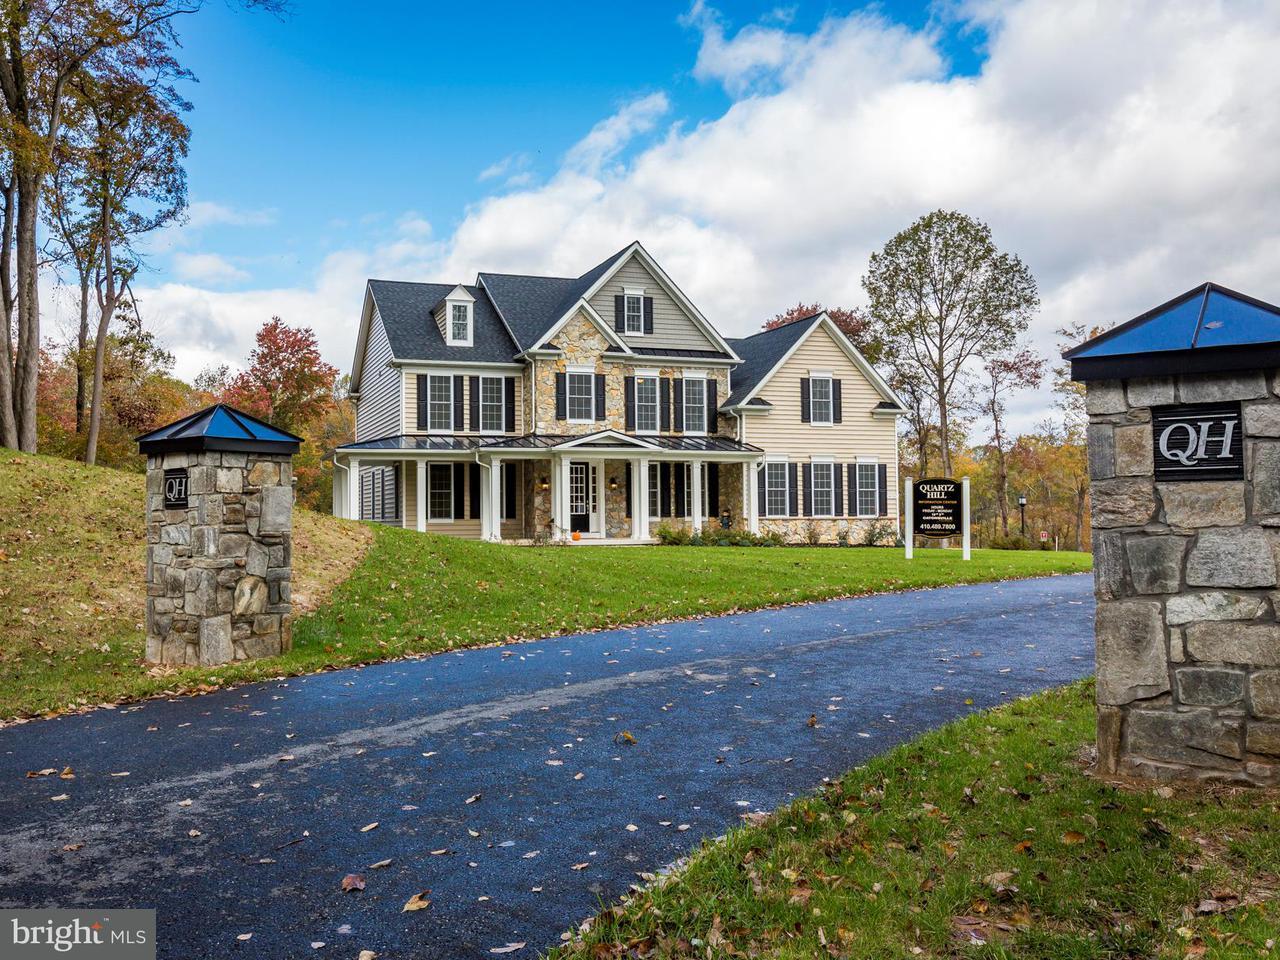 独户住宅 为 销售 在 14534 Old Frederick Road 14534 Old Frederick Road Cooksville, 马里兰州 21723 美国